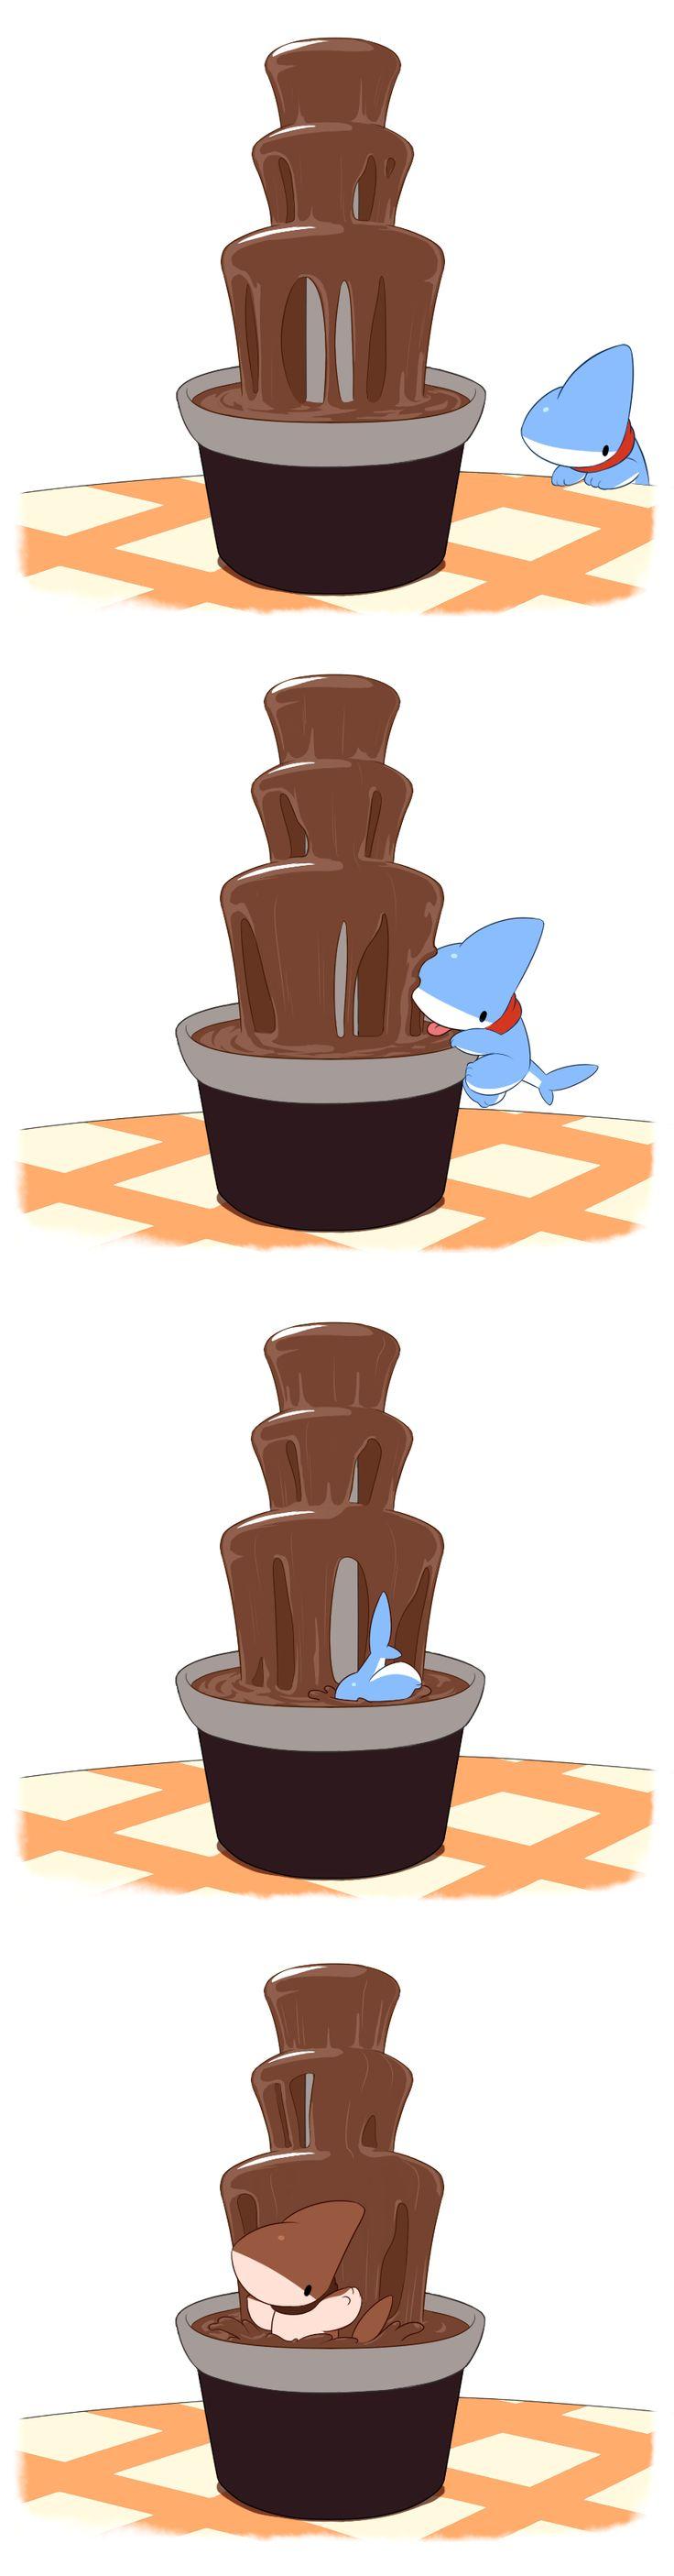 Chocolate+Fountain+by+0Vress0.deviantart.com+on+@DeviantArt